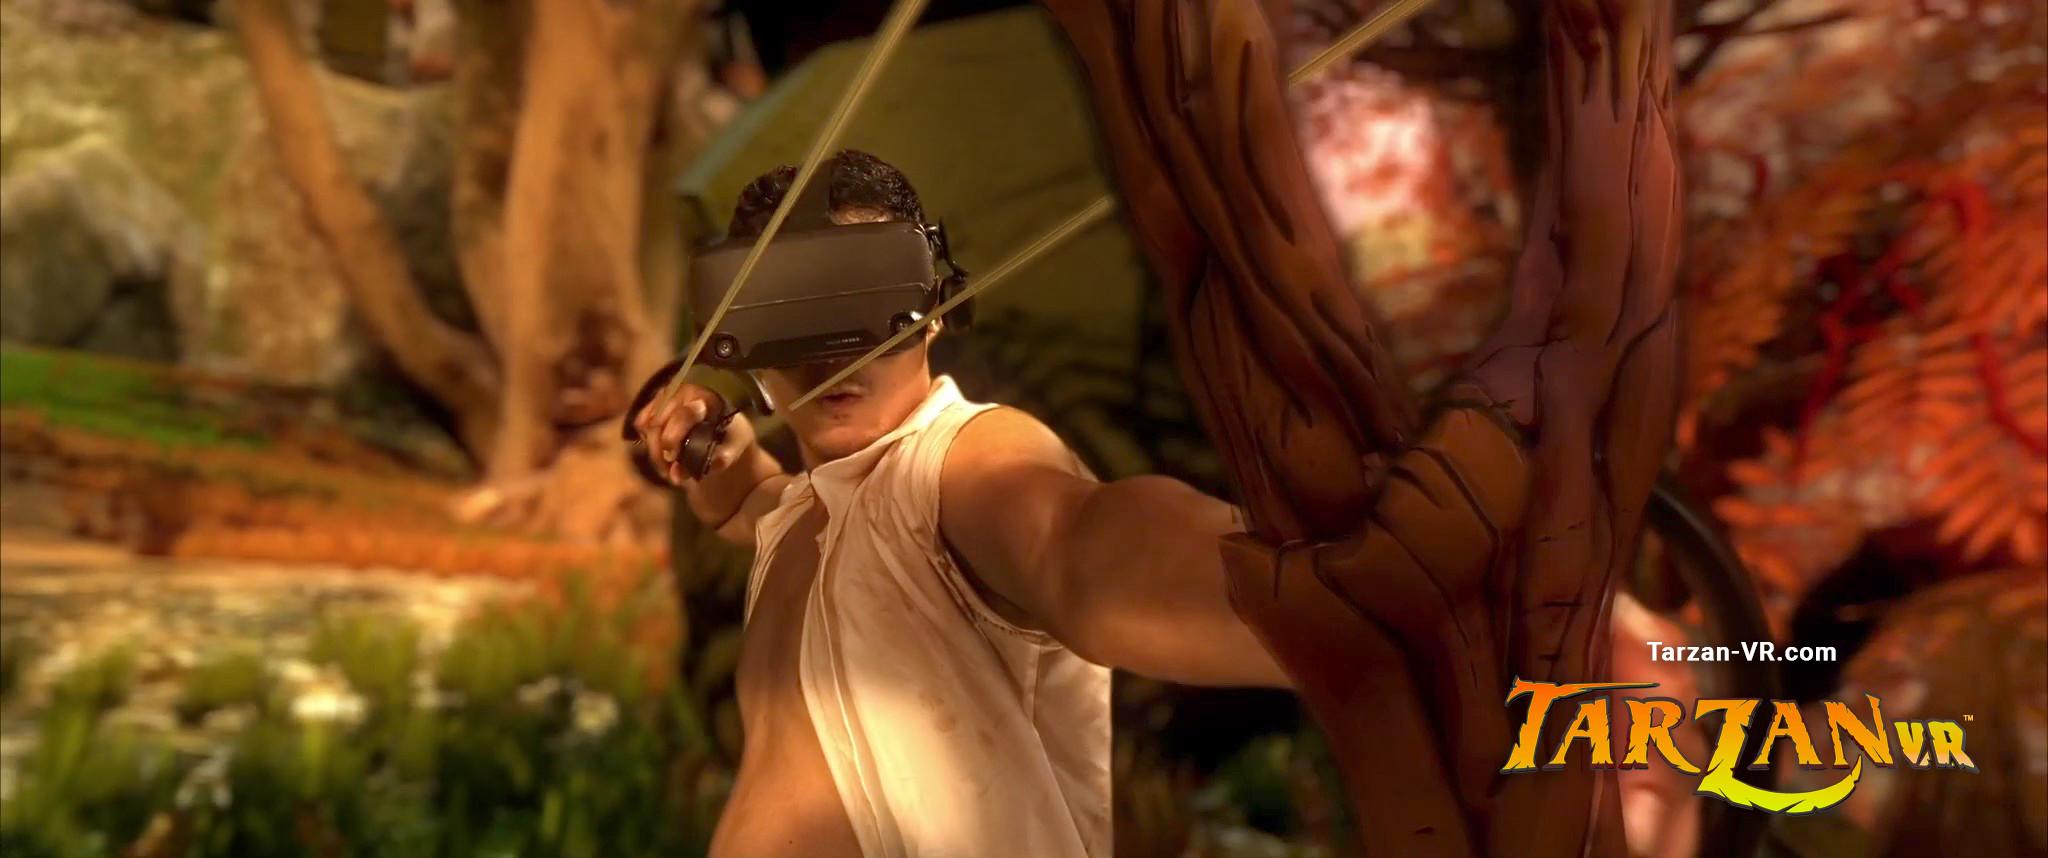 Tarzan VR Soundtrack screenshot